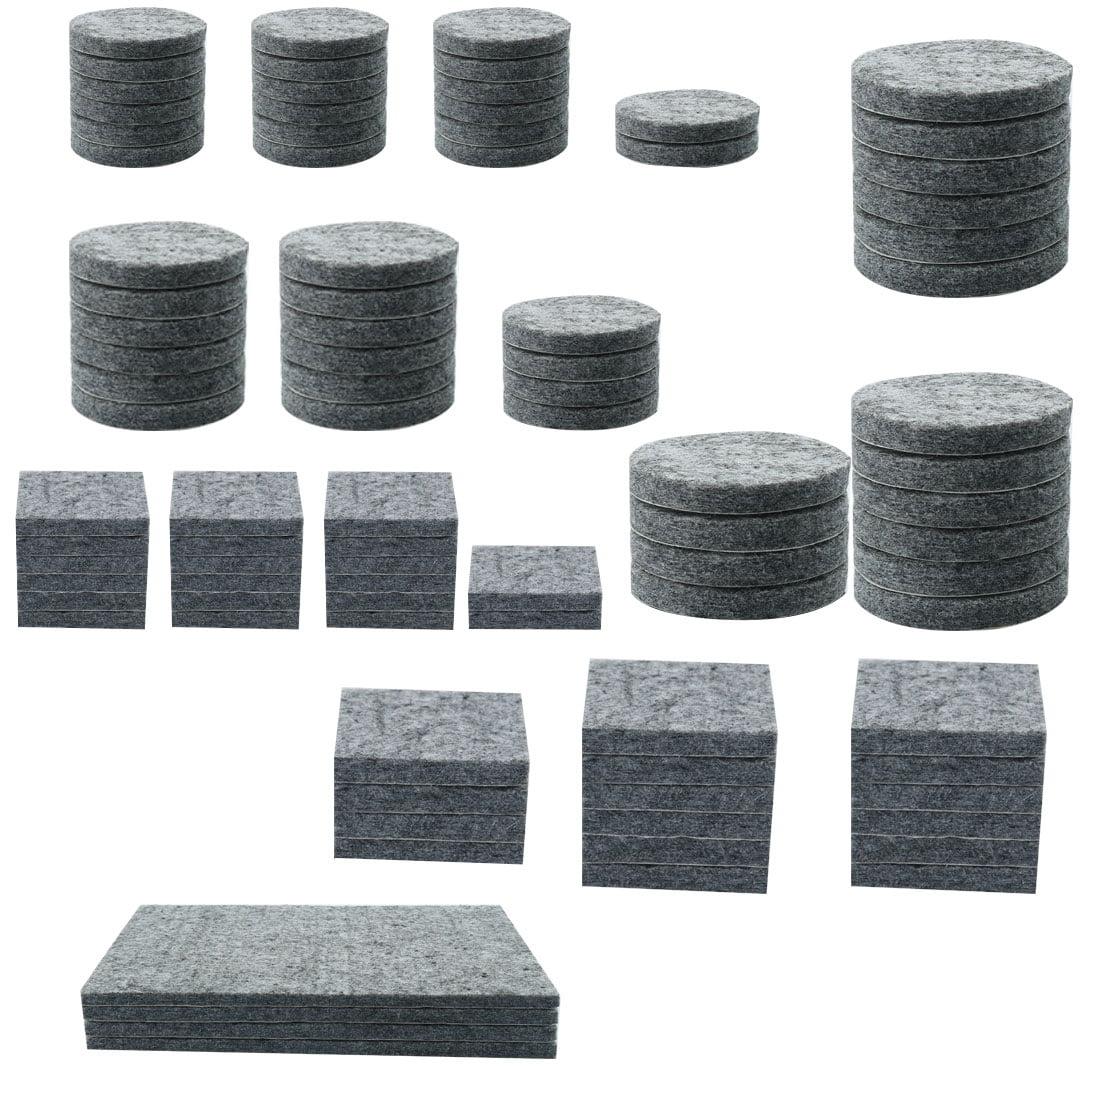 Felt Furniture Pad Self Adhesive Anti-scratch for Floor Protector Grey 86pcs - image 7 de 7